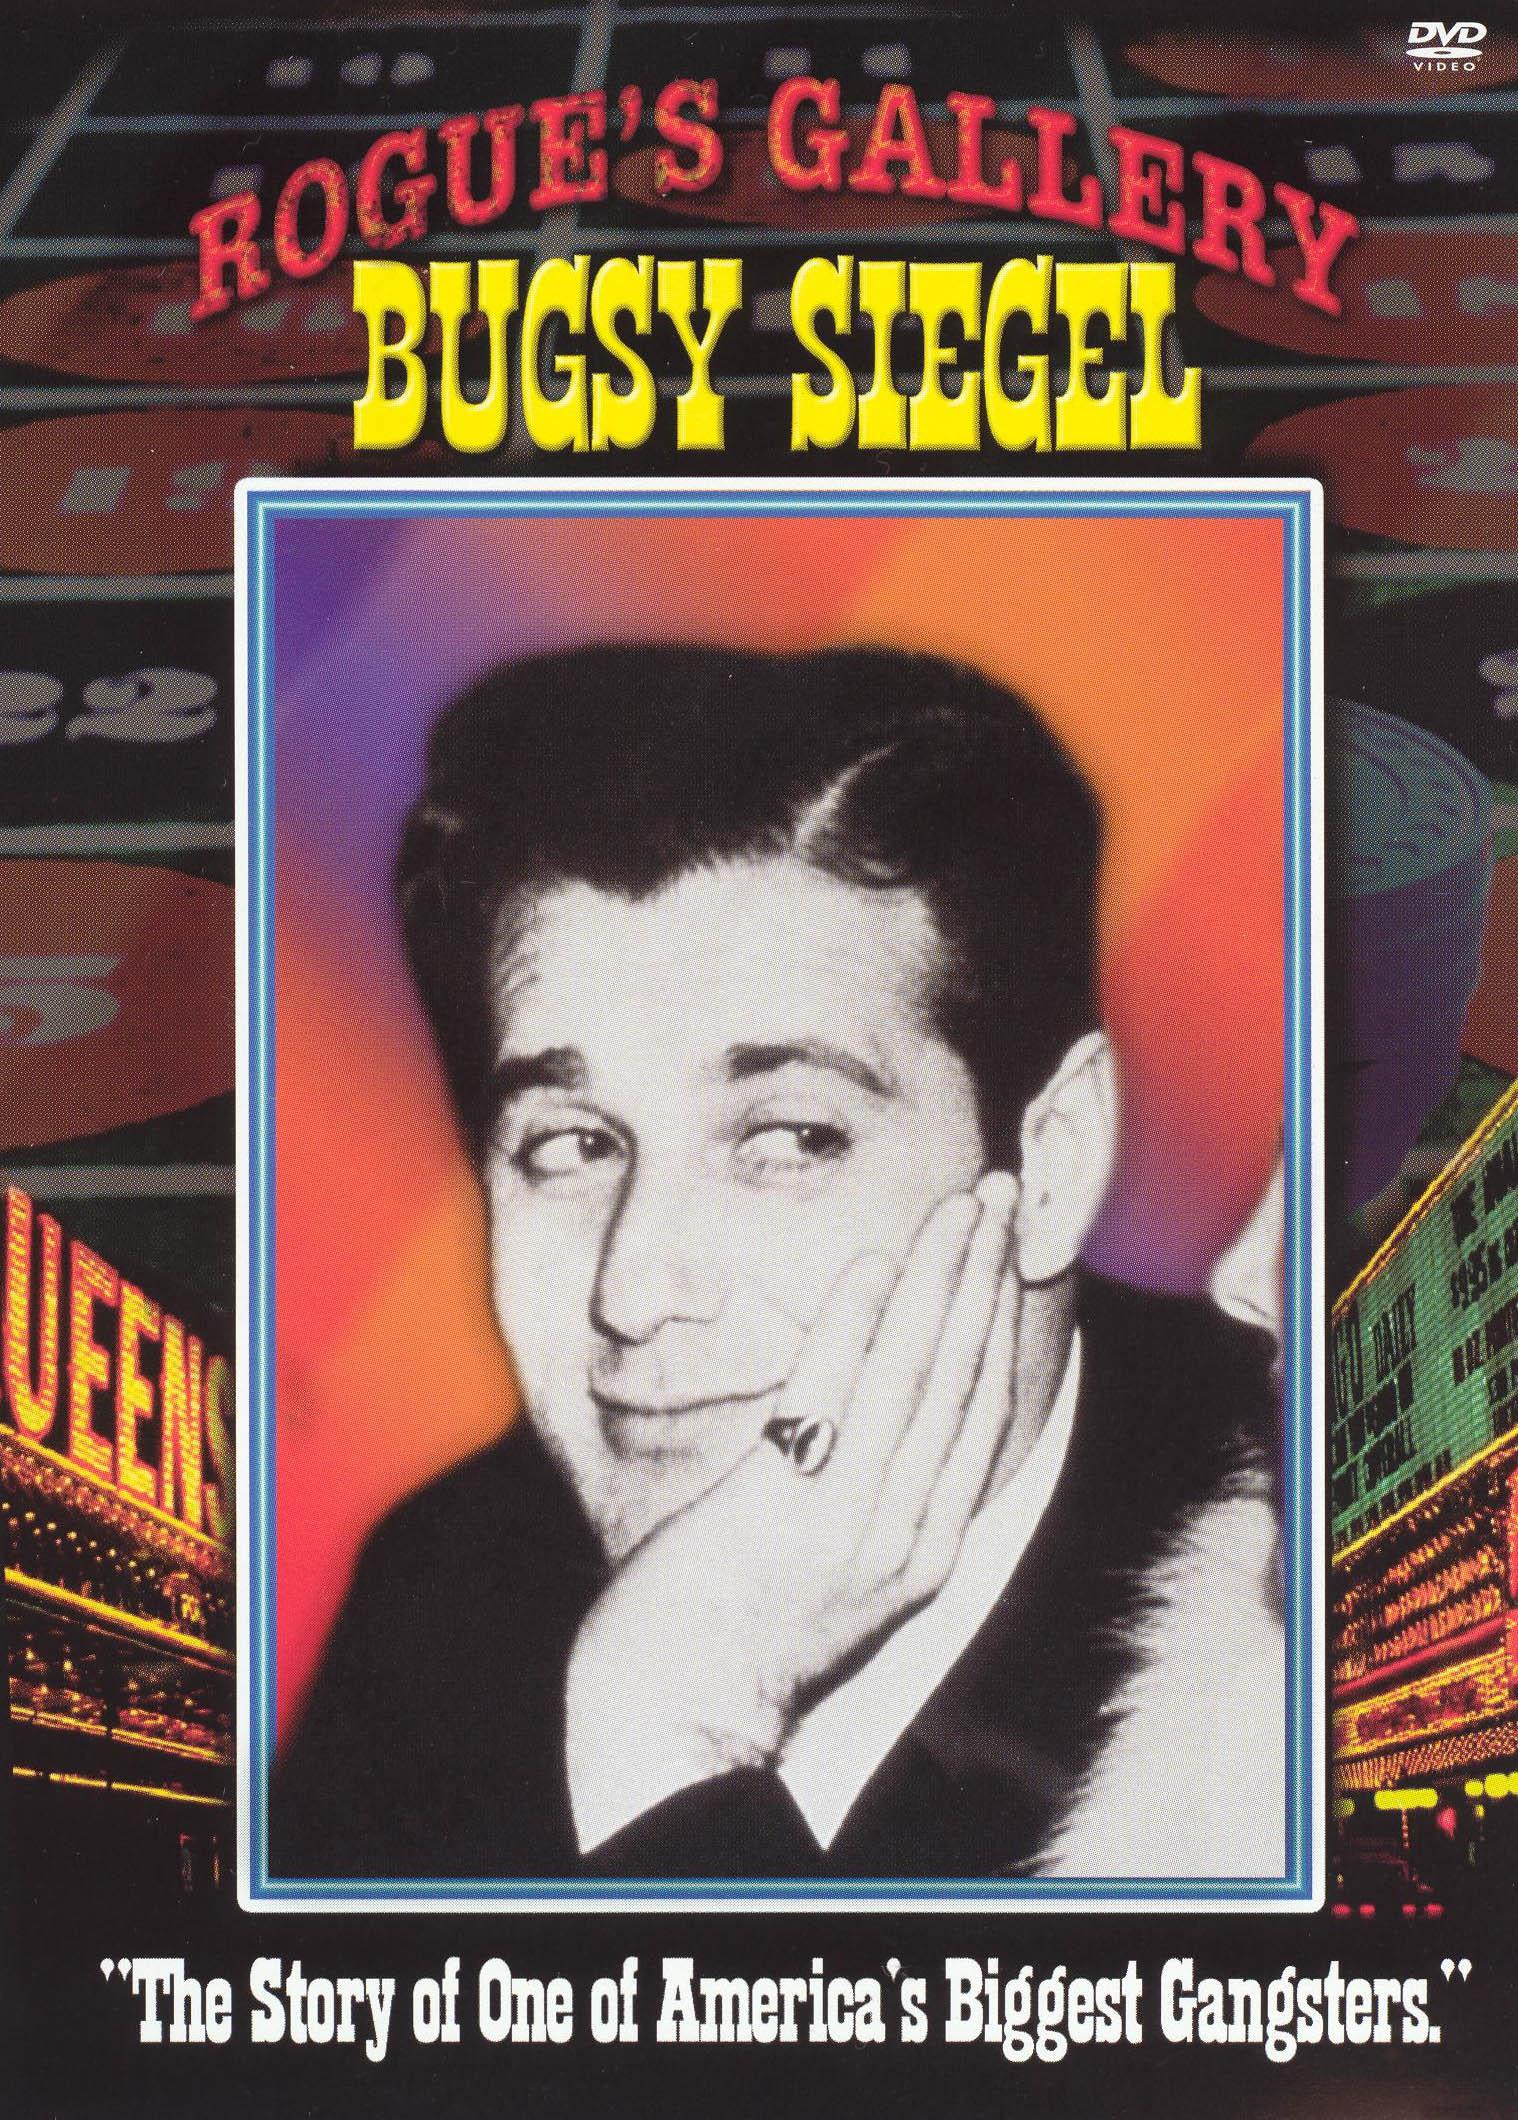 West Coast Rogues Gallery: Bugsy Siegel